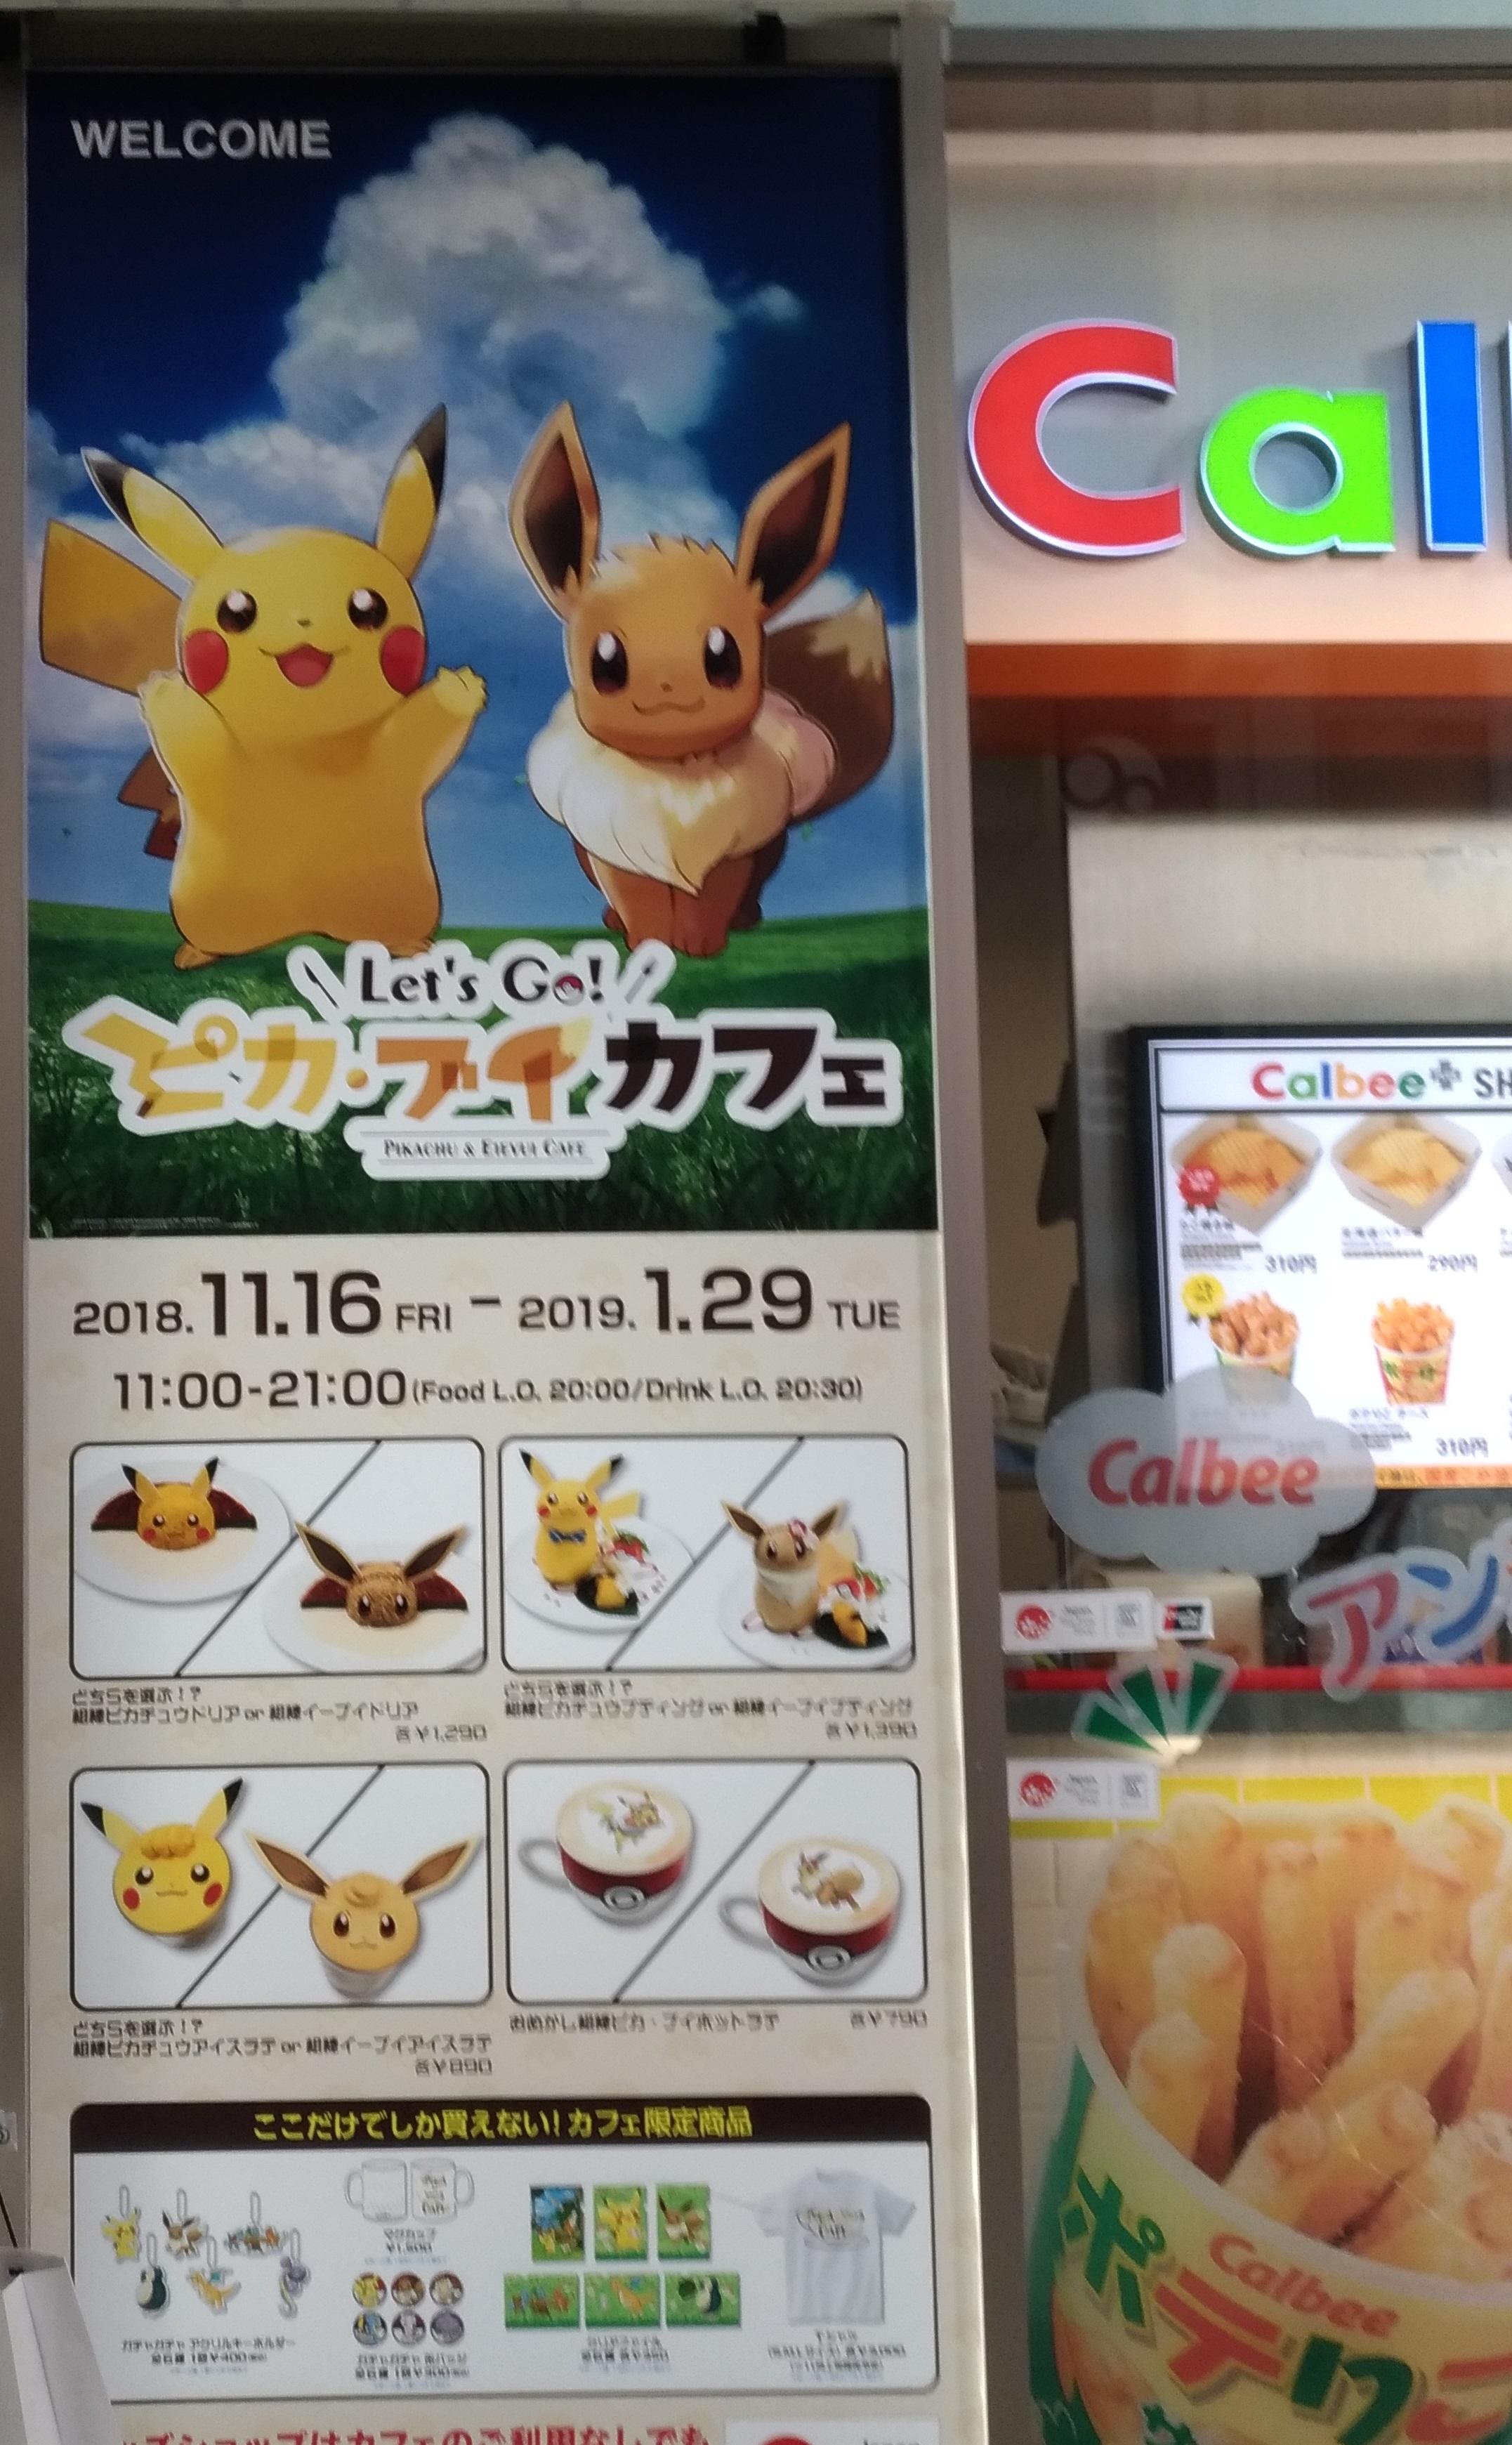 osaka_pikachu_cafe_pokemon2.jpg